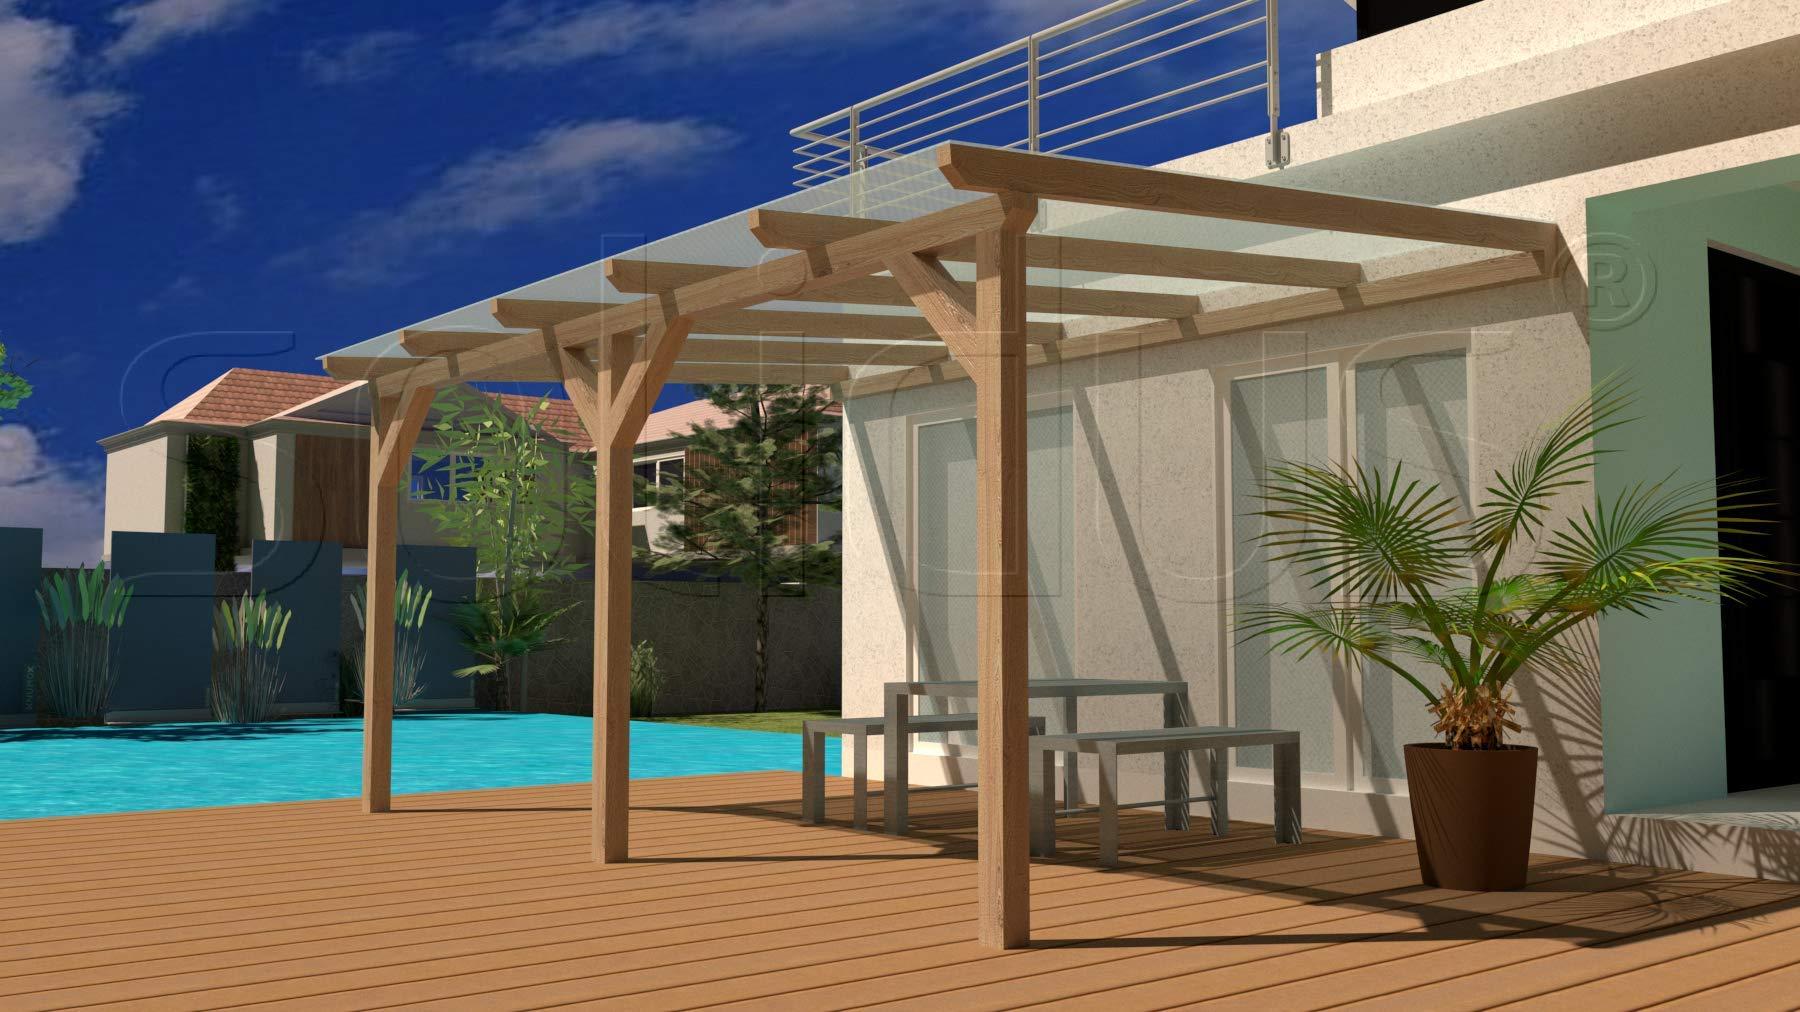 solidBASIC - Toldo para terraza de madera encolada de 700 x 200 cm (ancho x profundo) + planchas alveolares + accesorios – sin tratar/natural – cubierta para terraza de madera para el